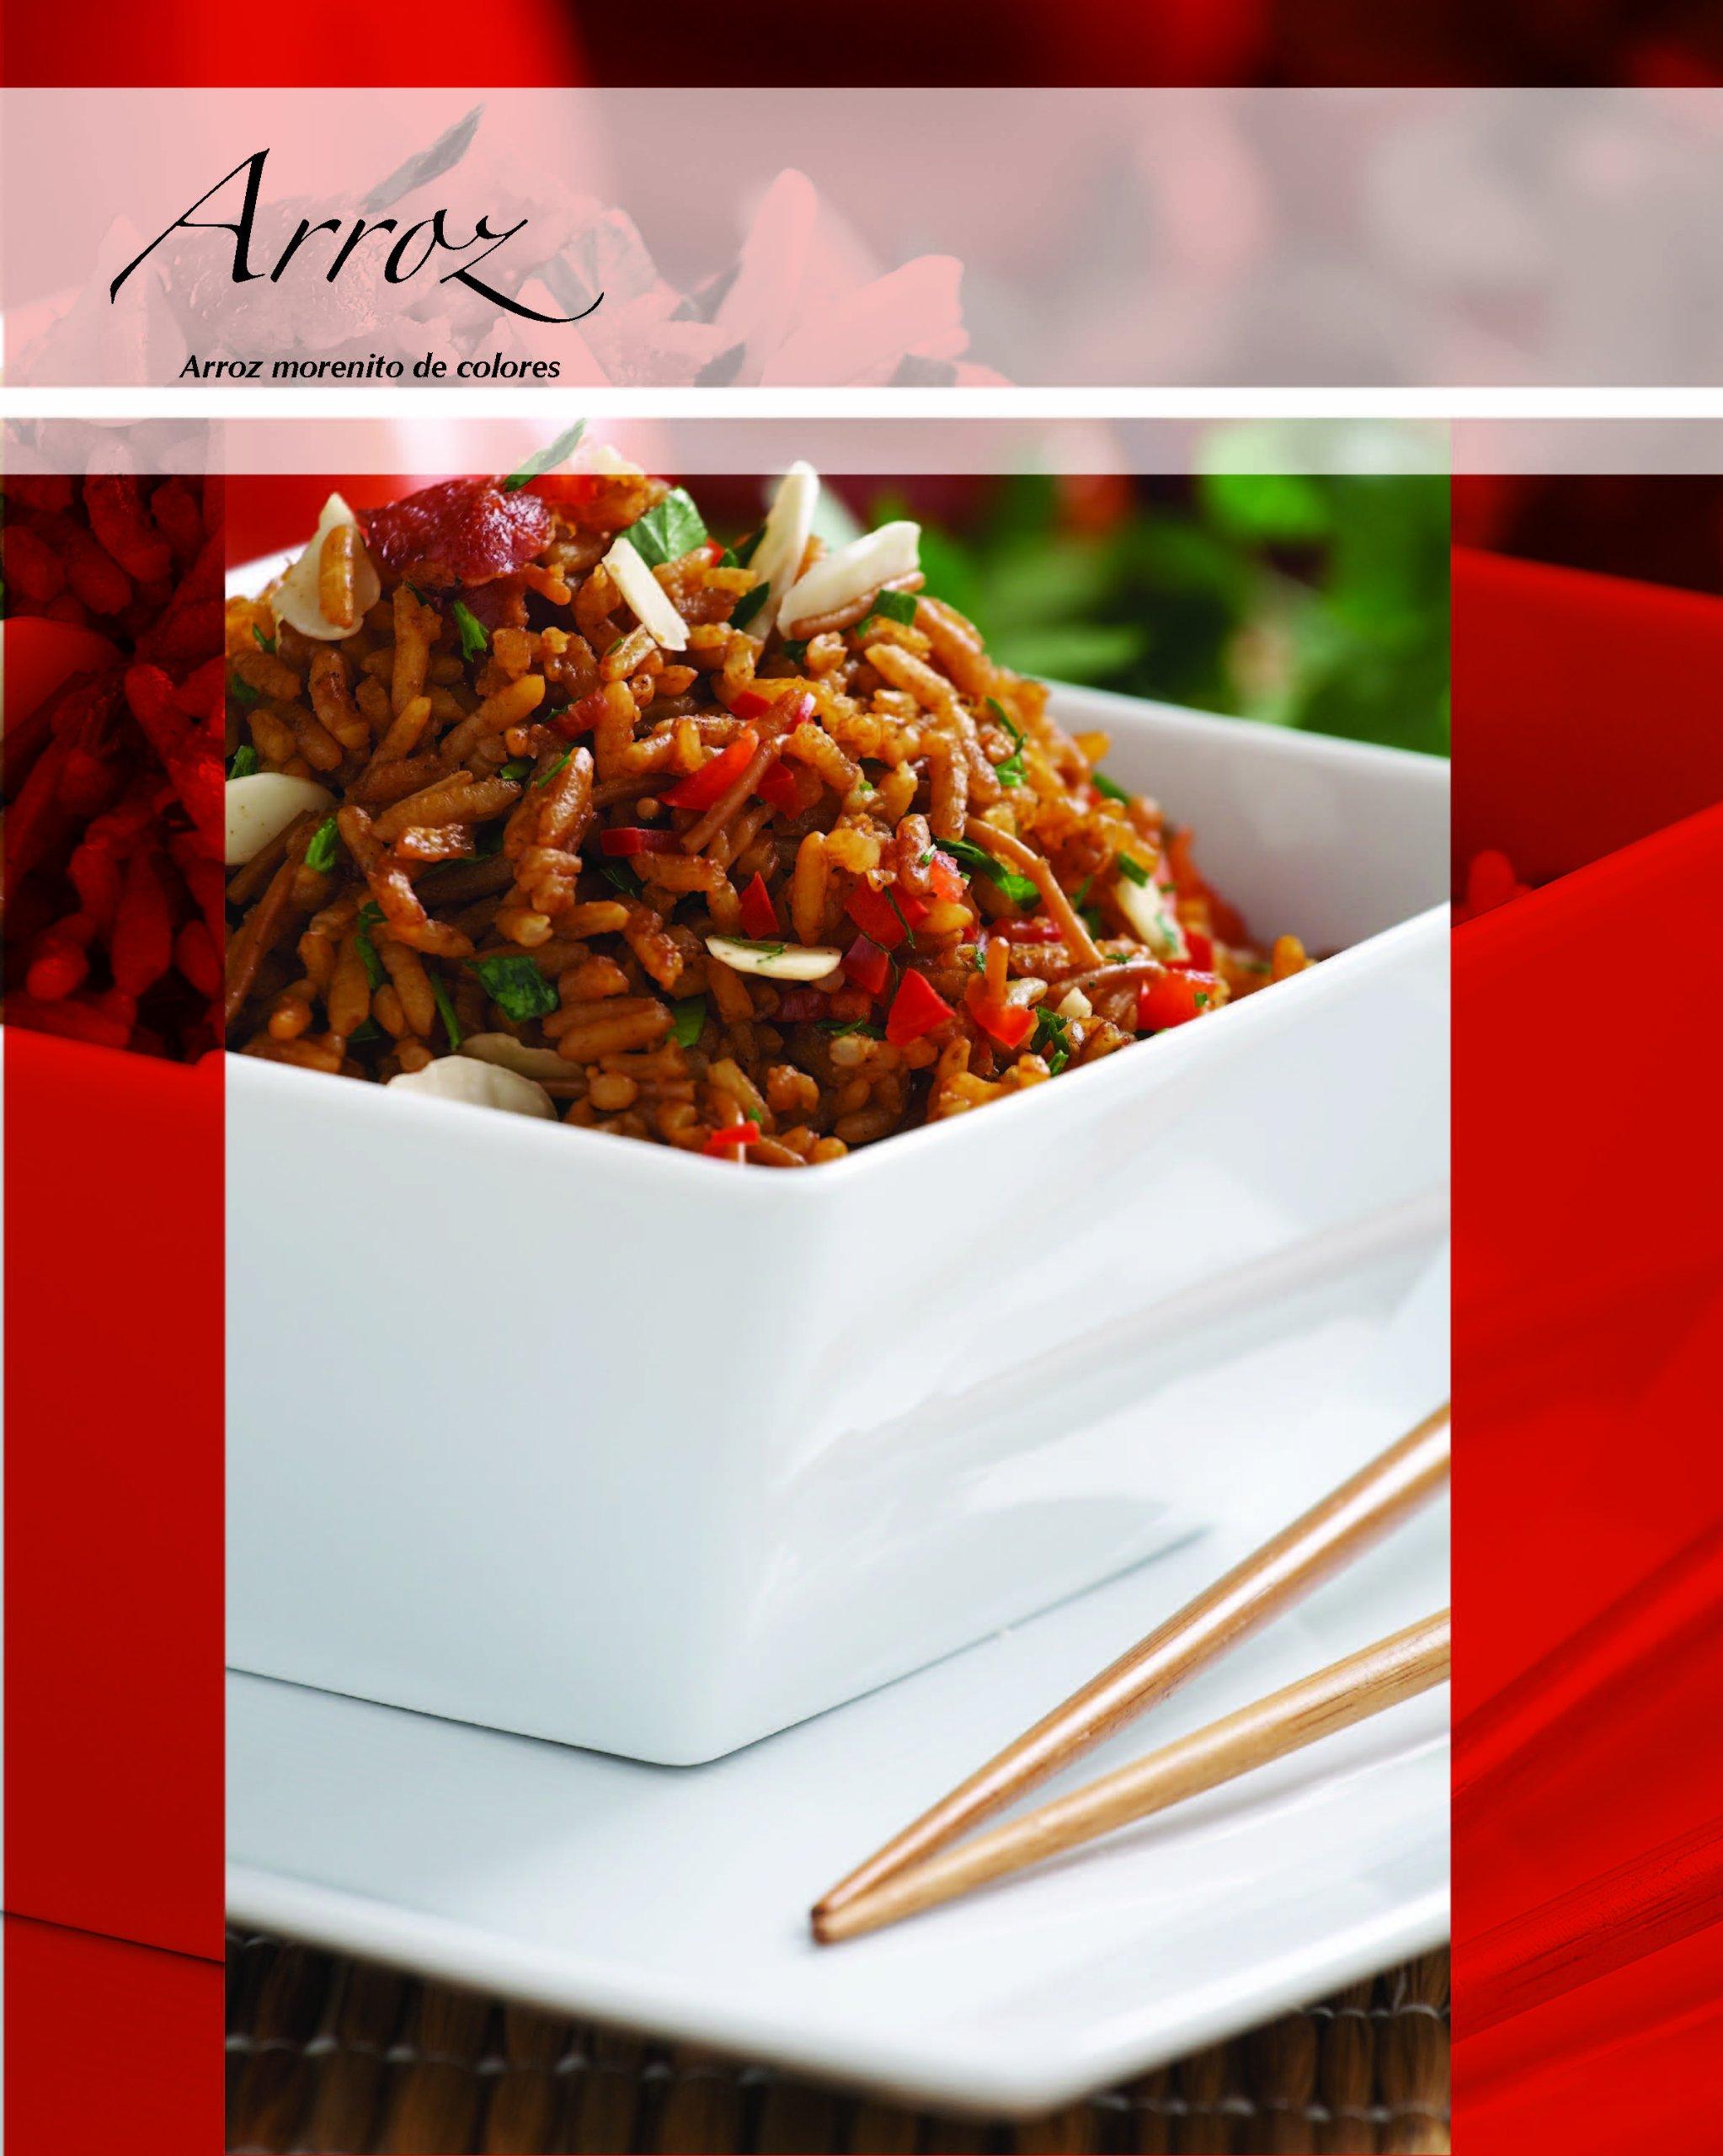 Partituras Culinarias: Sylvia Bravo de Londono: 9789584417473: Amazon.com: Books